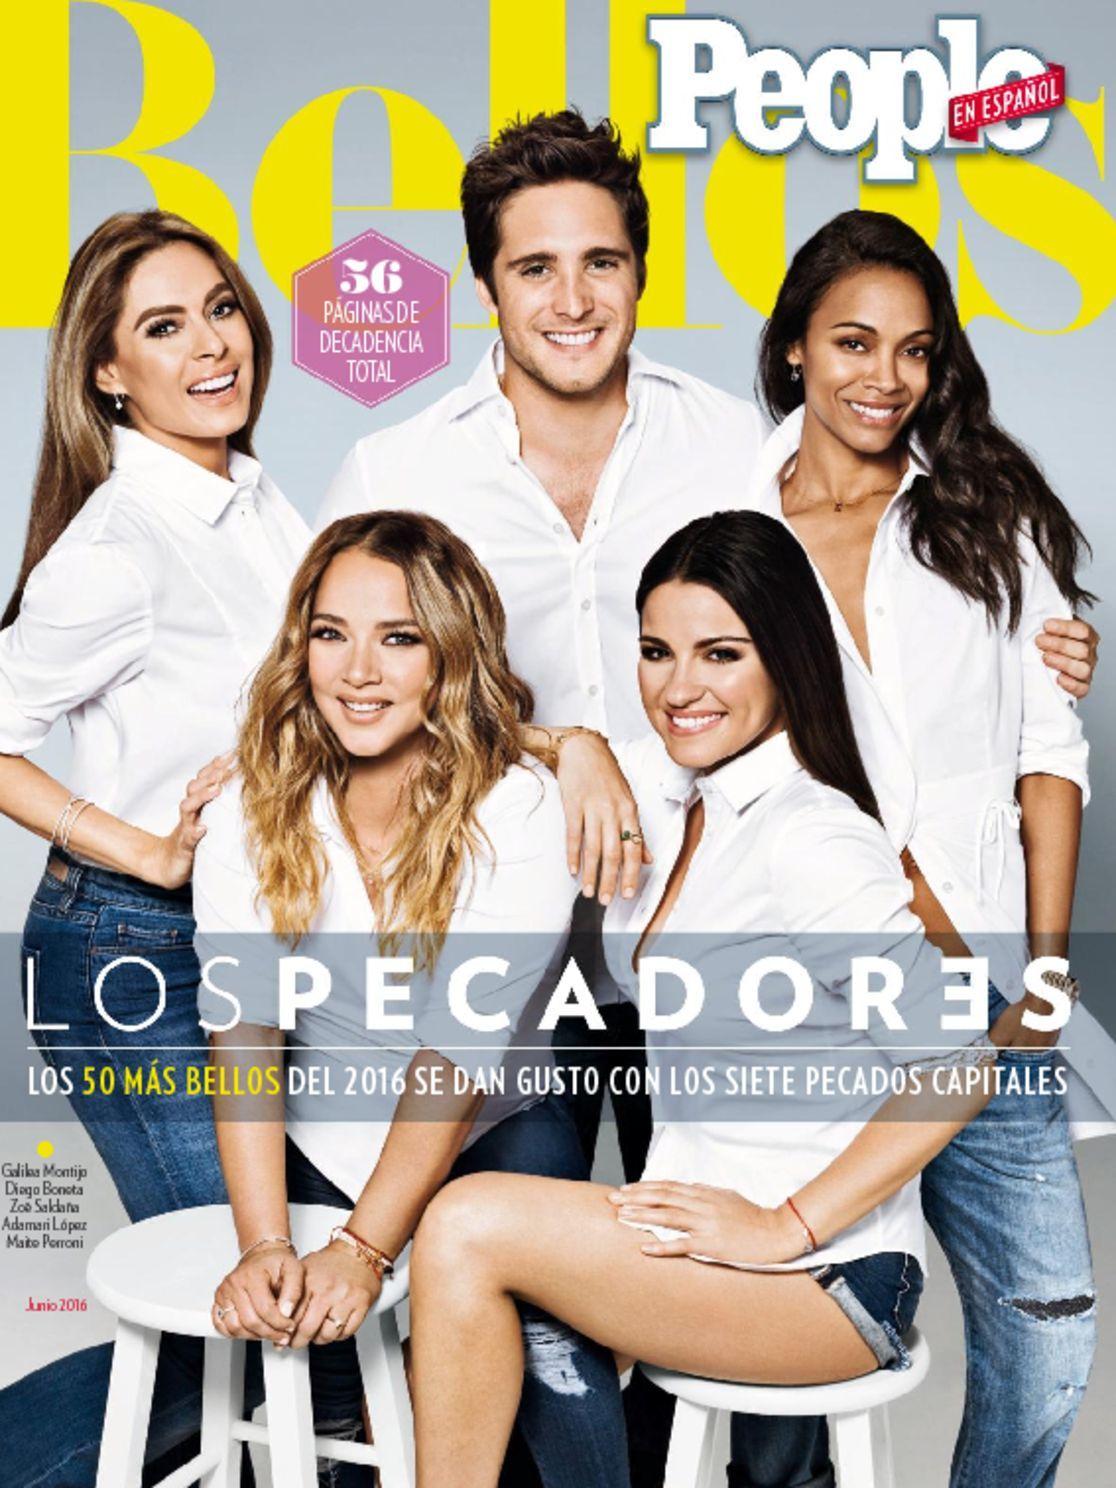 espanol bellos los magazine diego boneta revista rebelde maite mas june rbd espanol perroni fotos celebrities hispanic most names del